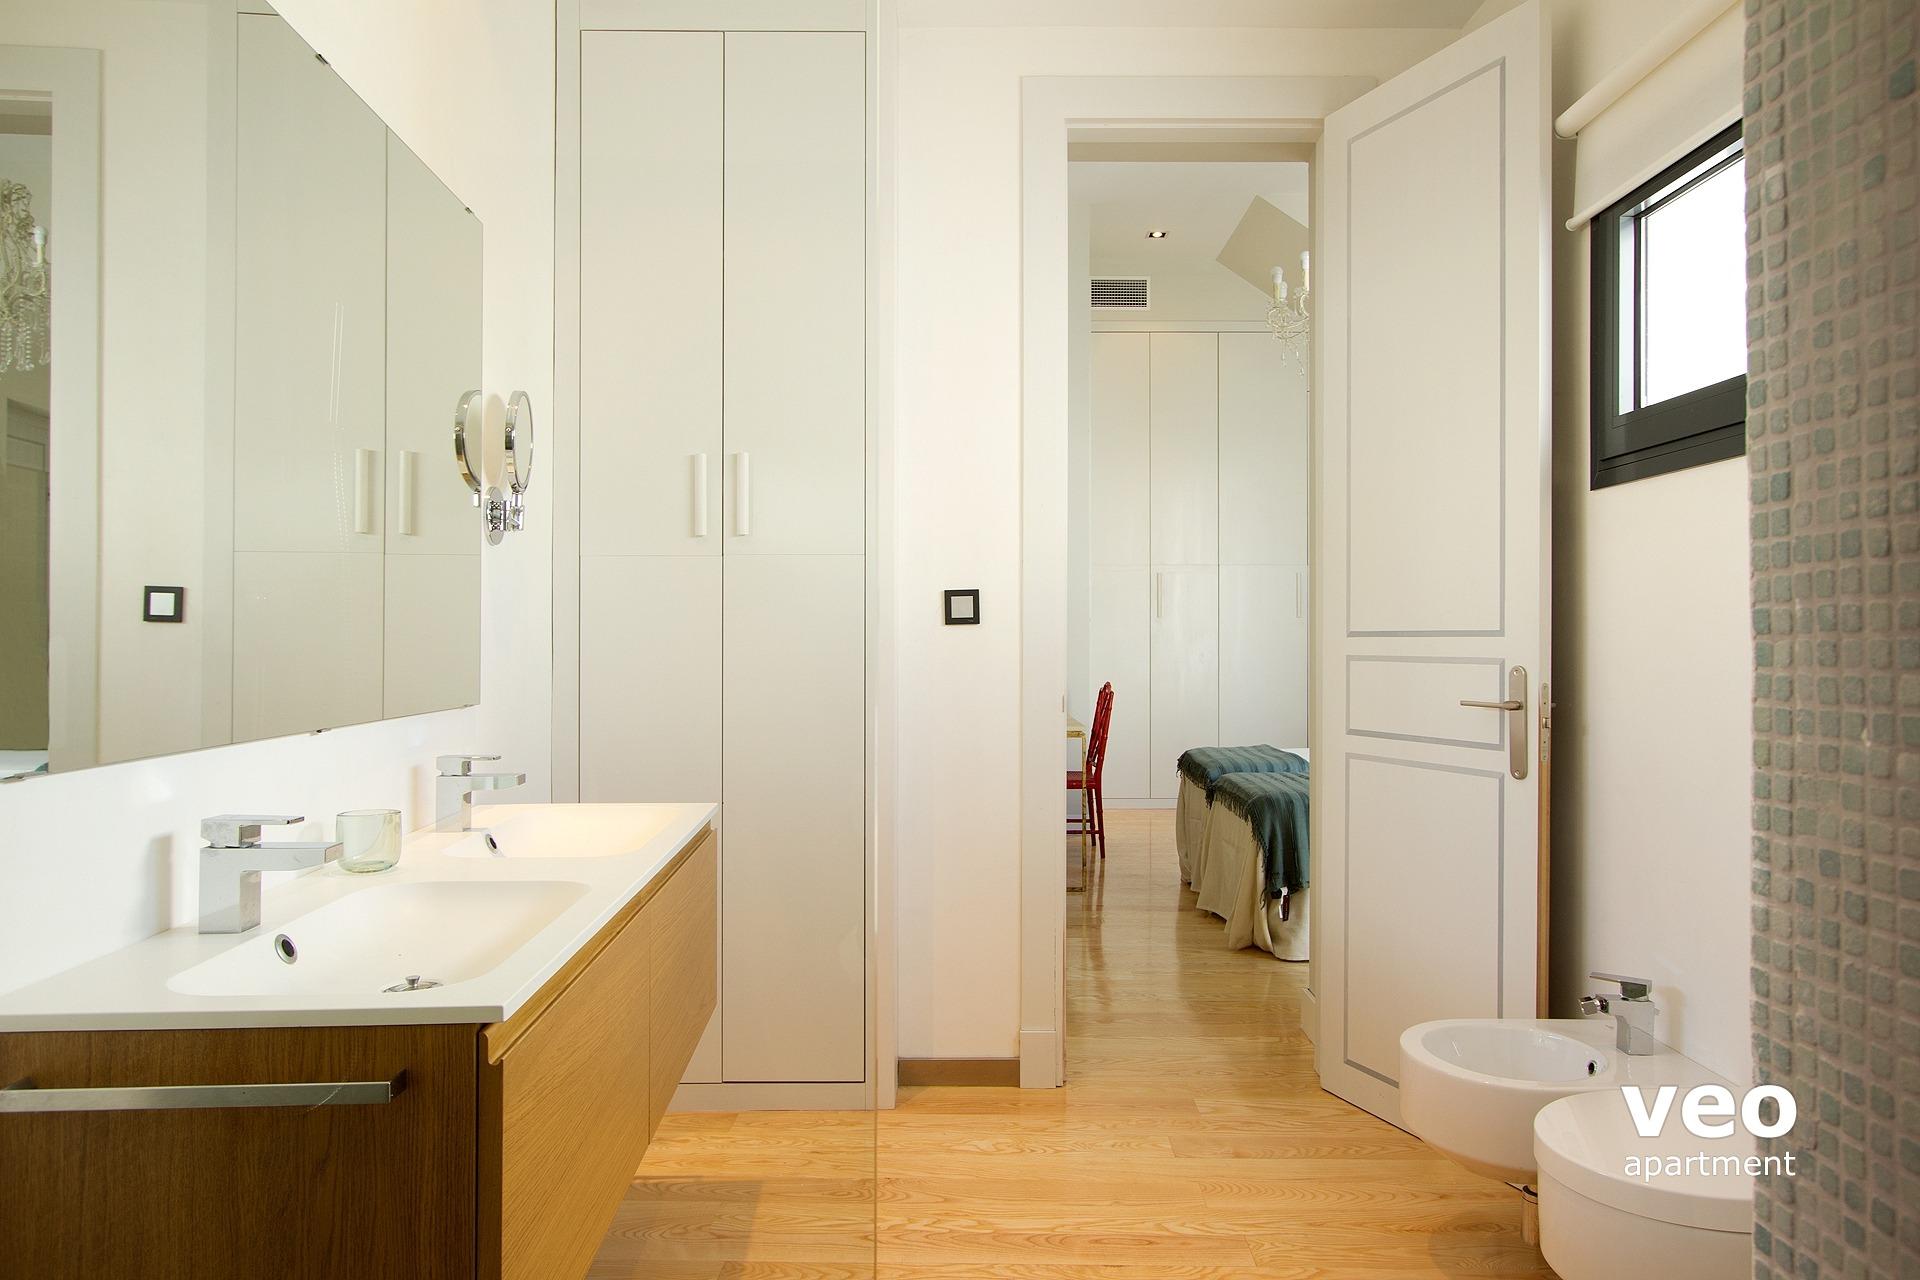 Non En Suite Bathroom: Seville Apartment Teodosio Street Seville Spain